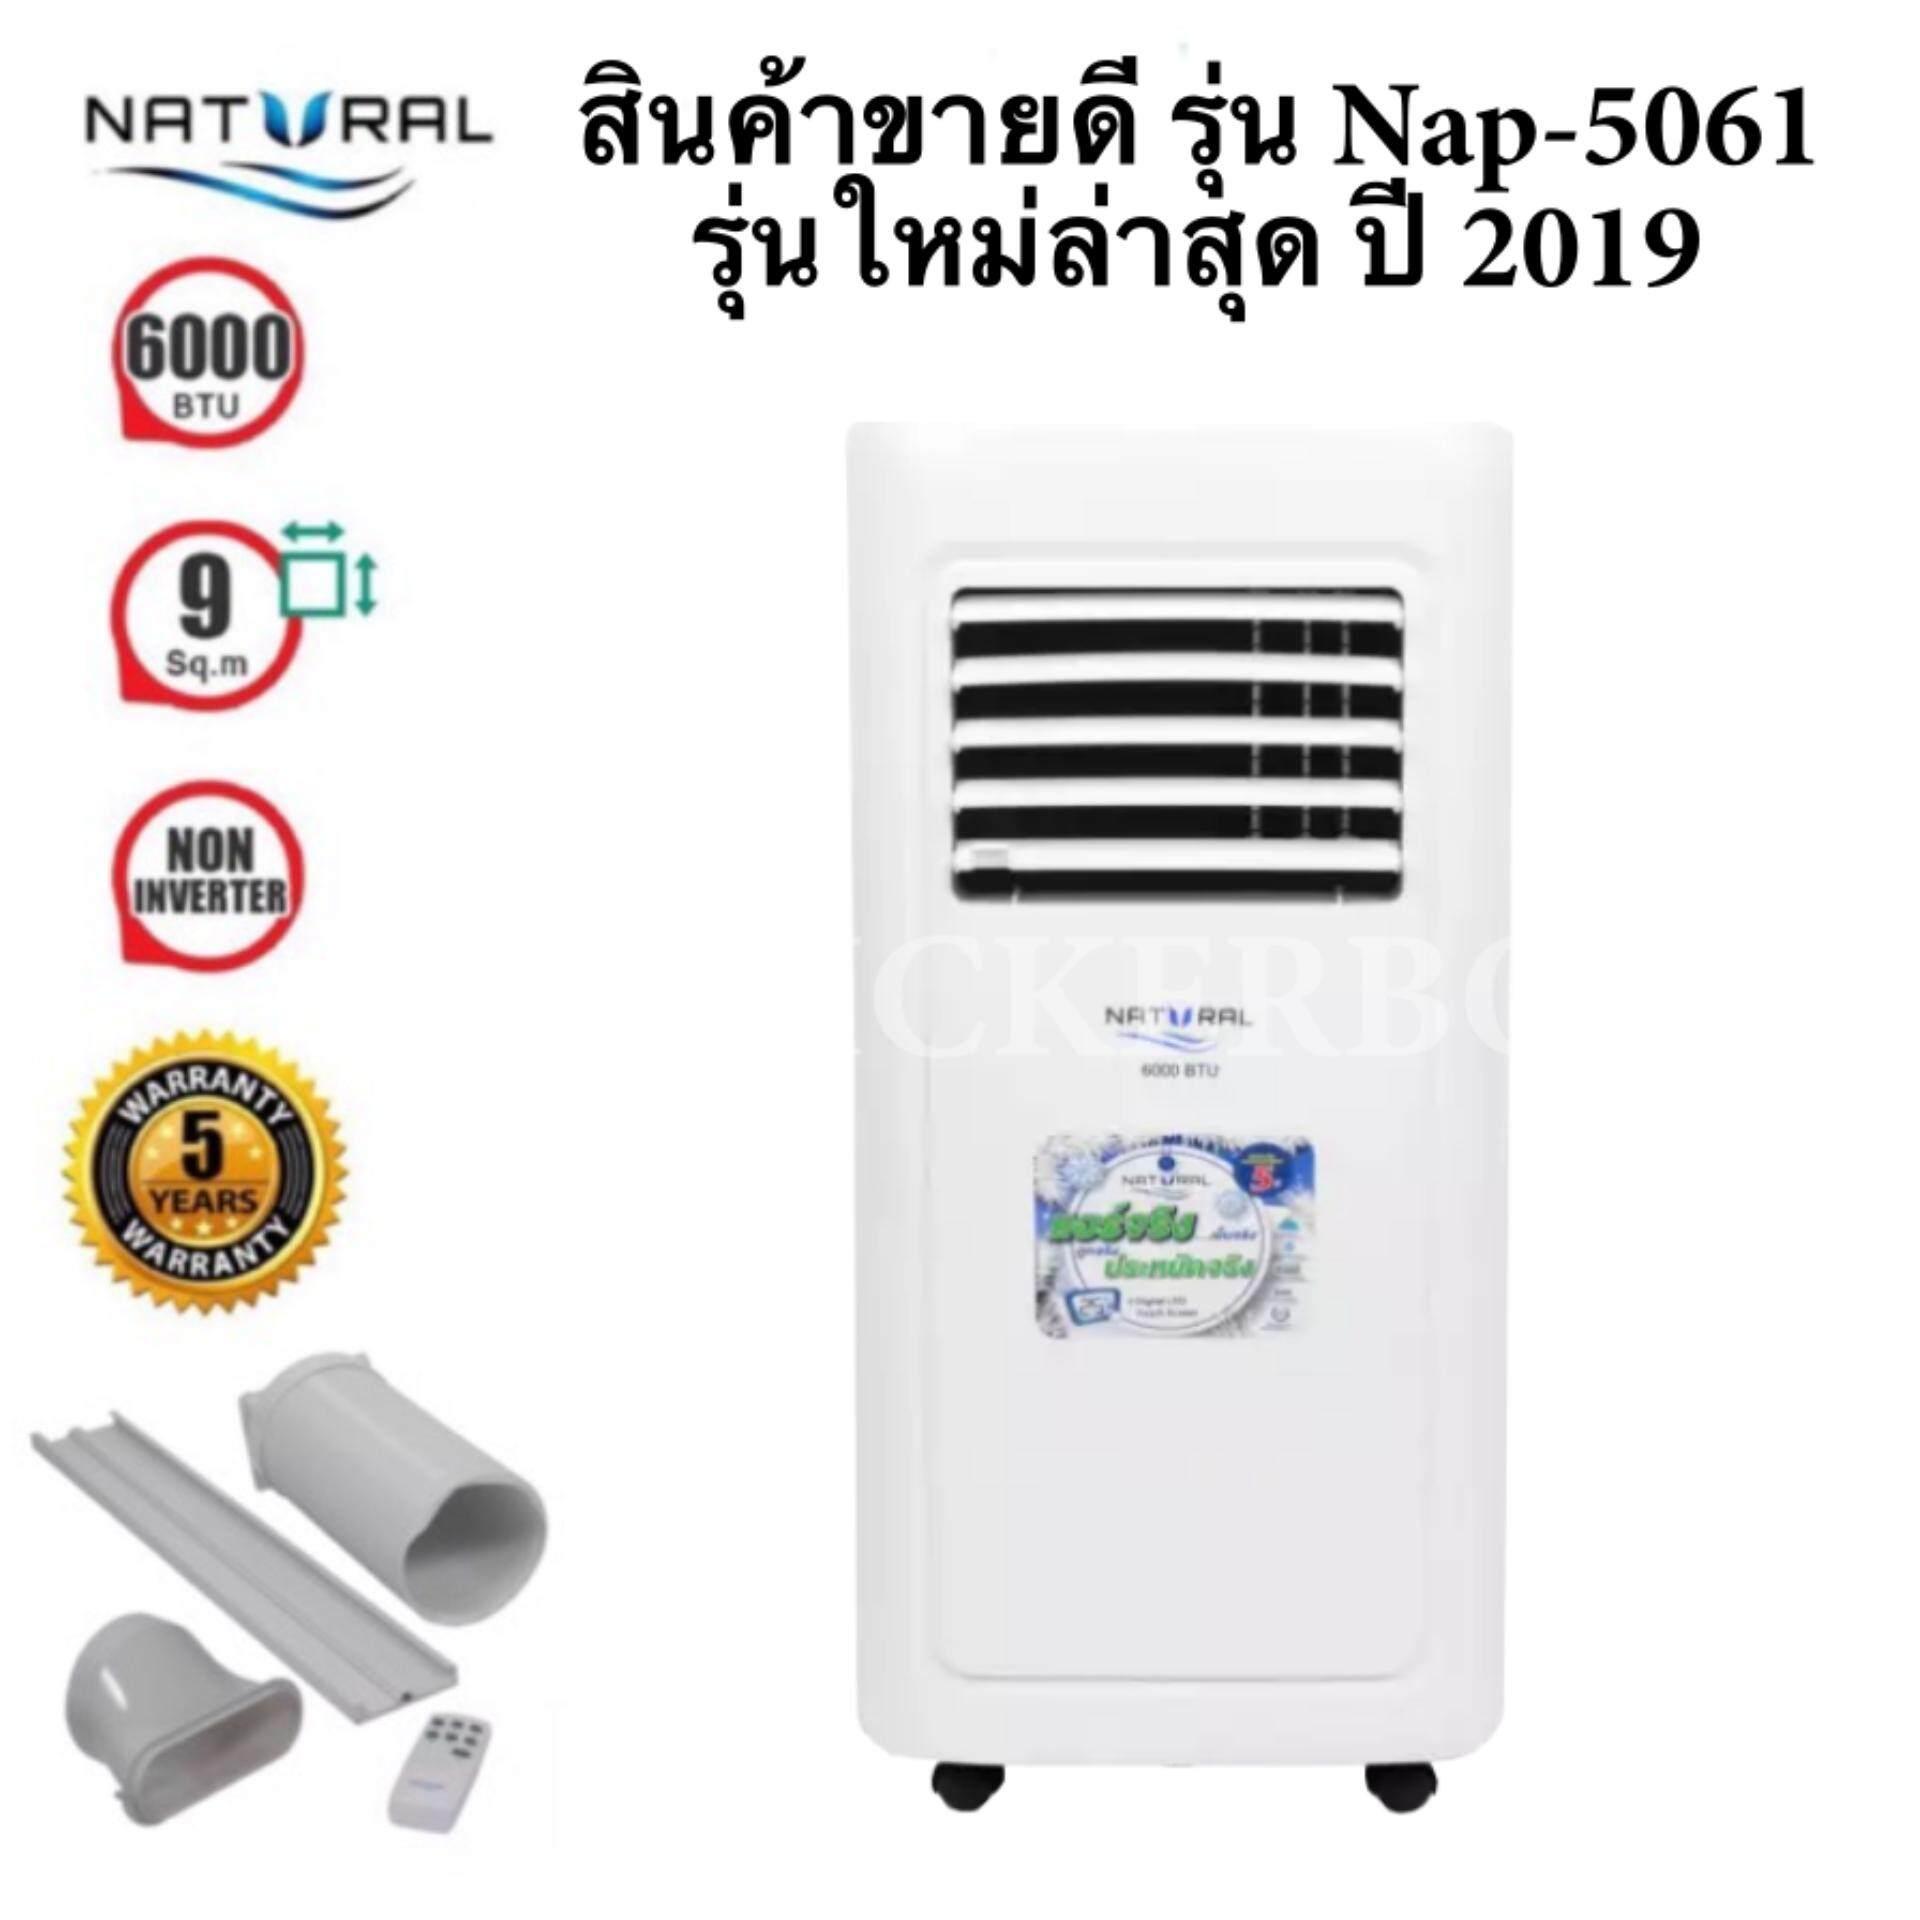 Natural 6,000 BTU รับประกันศูนย์ แอร์คอนดิชั่น เคลื่อนที่ NAP-5061 แอร์รุ่นใหม่ 2019